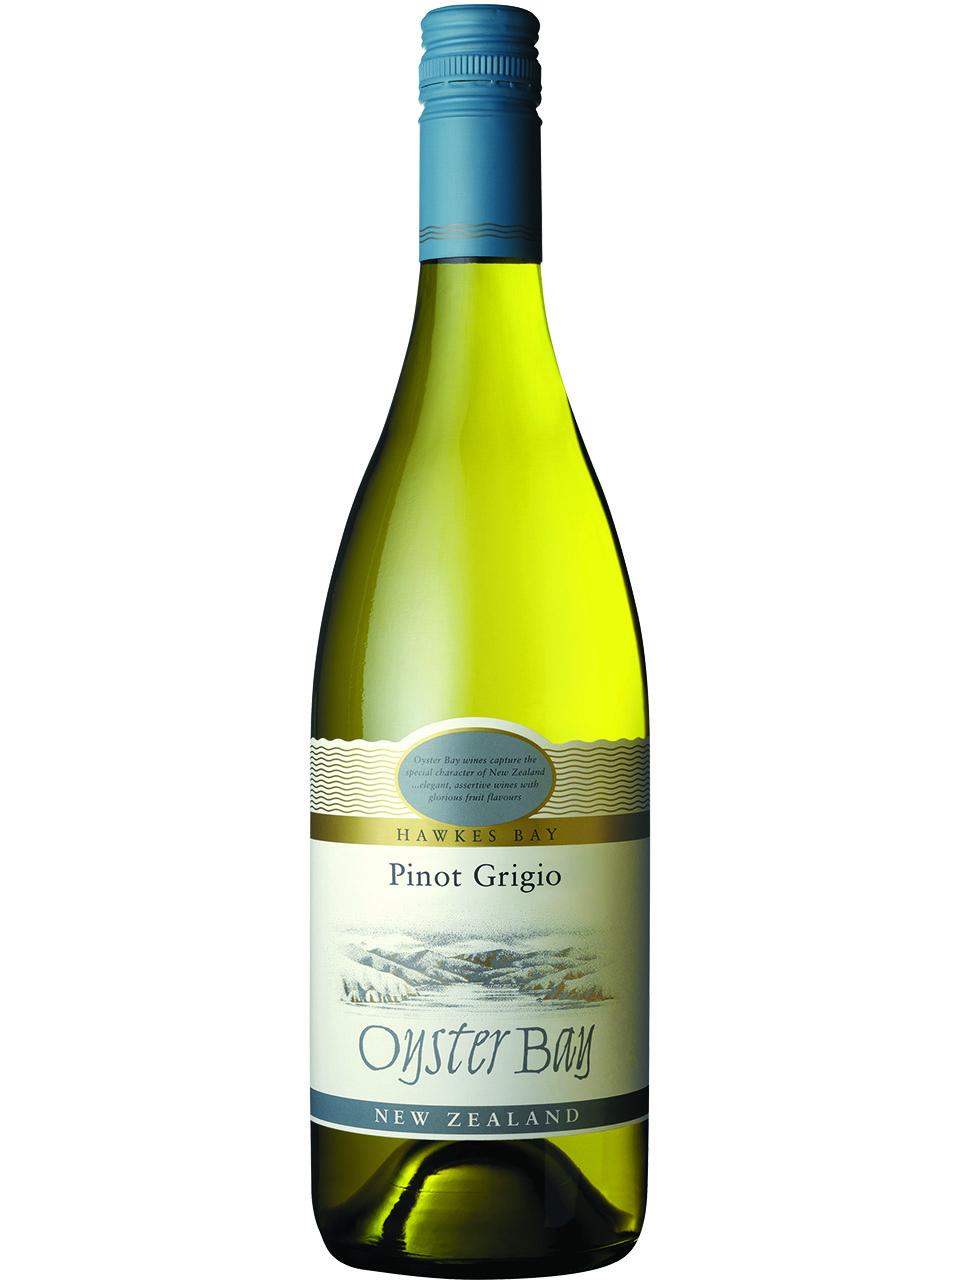 Oyster Bay Hawkes Bay Pinot Grigio